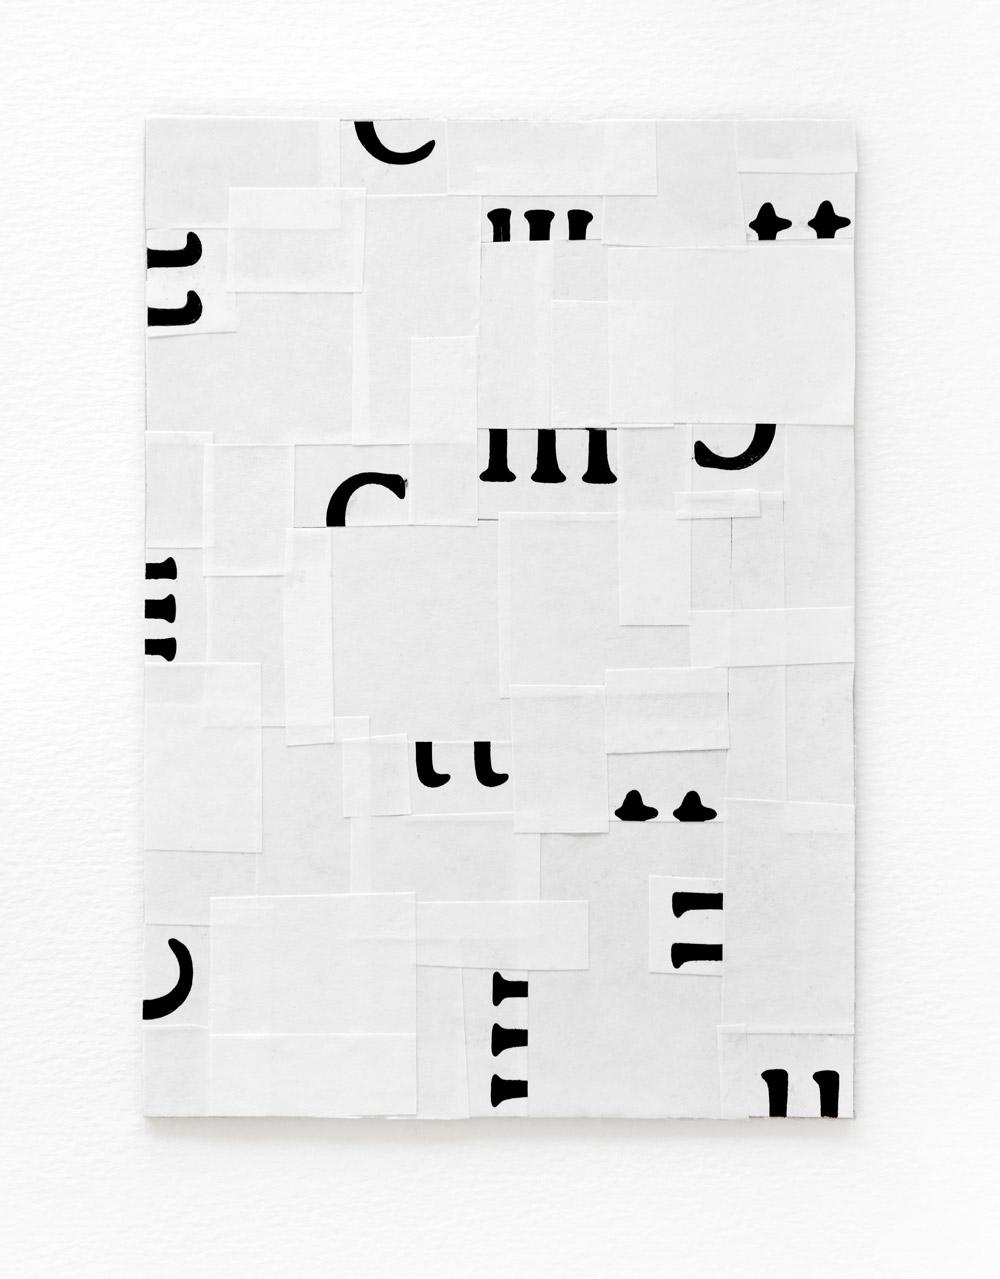 typographic collage series, no. 5